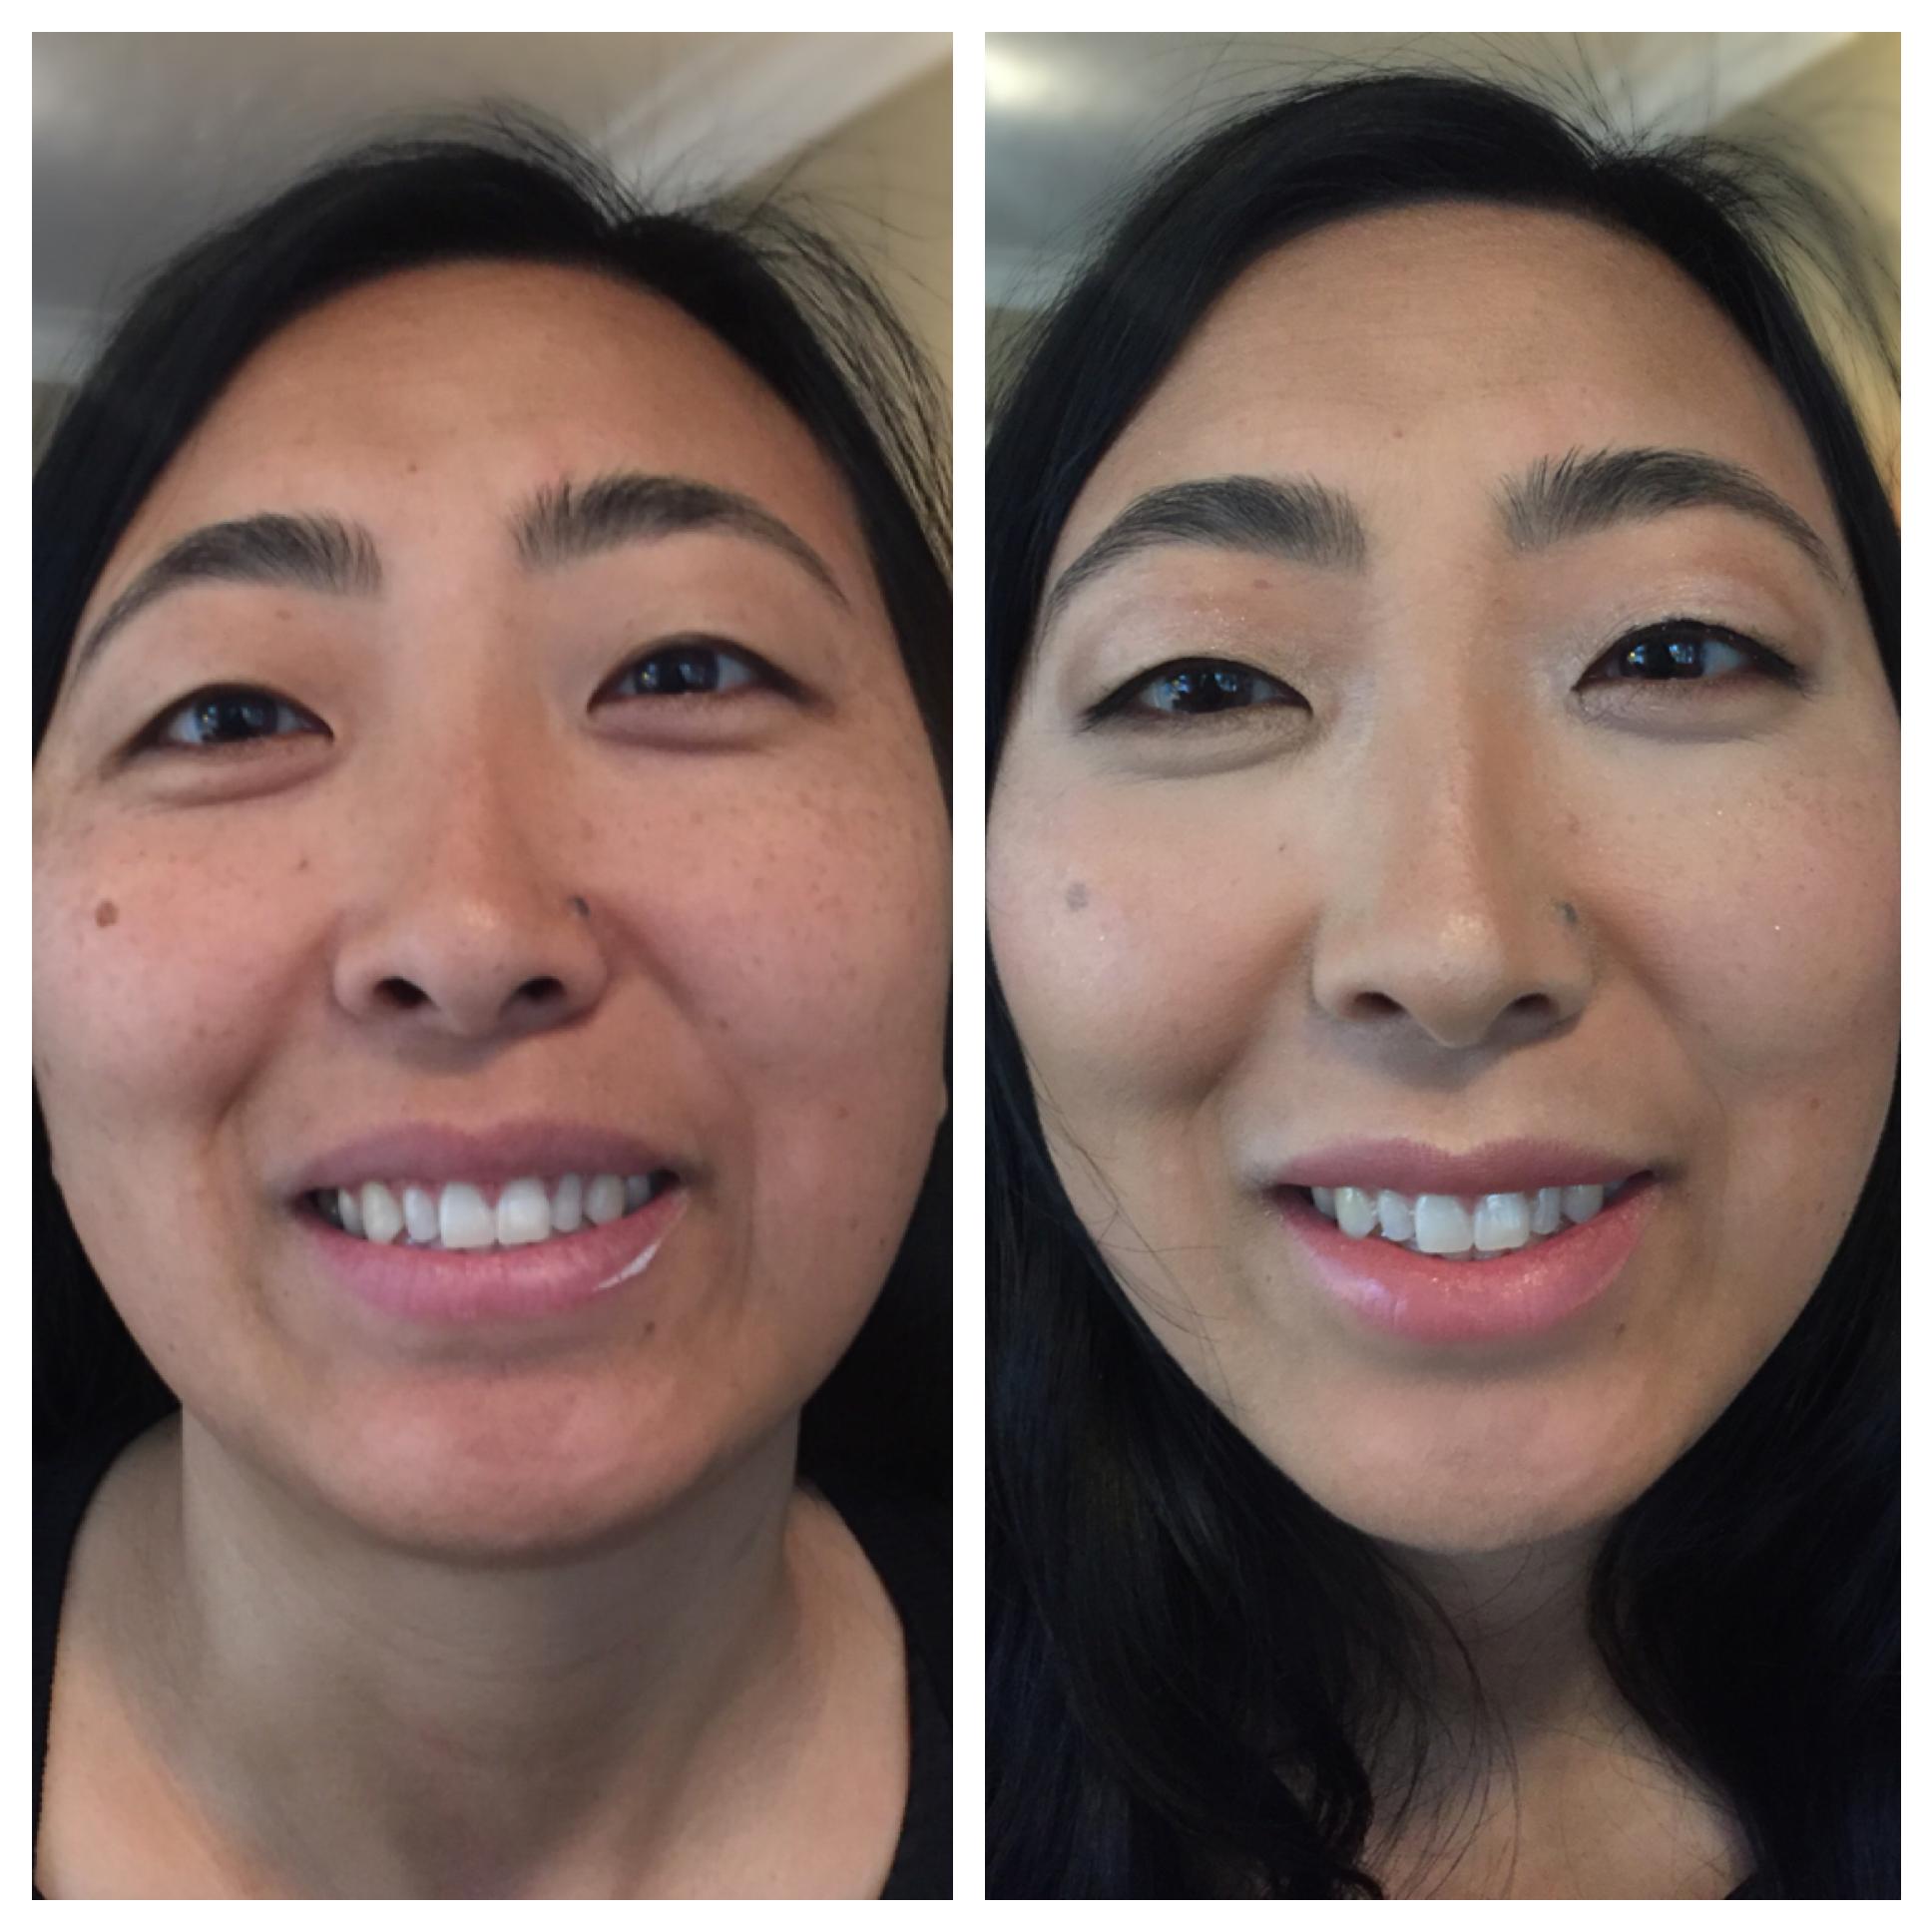 Makeup Artist | Portland, OR